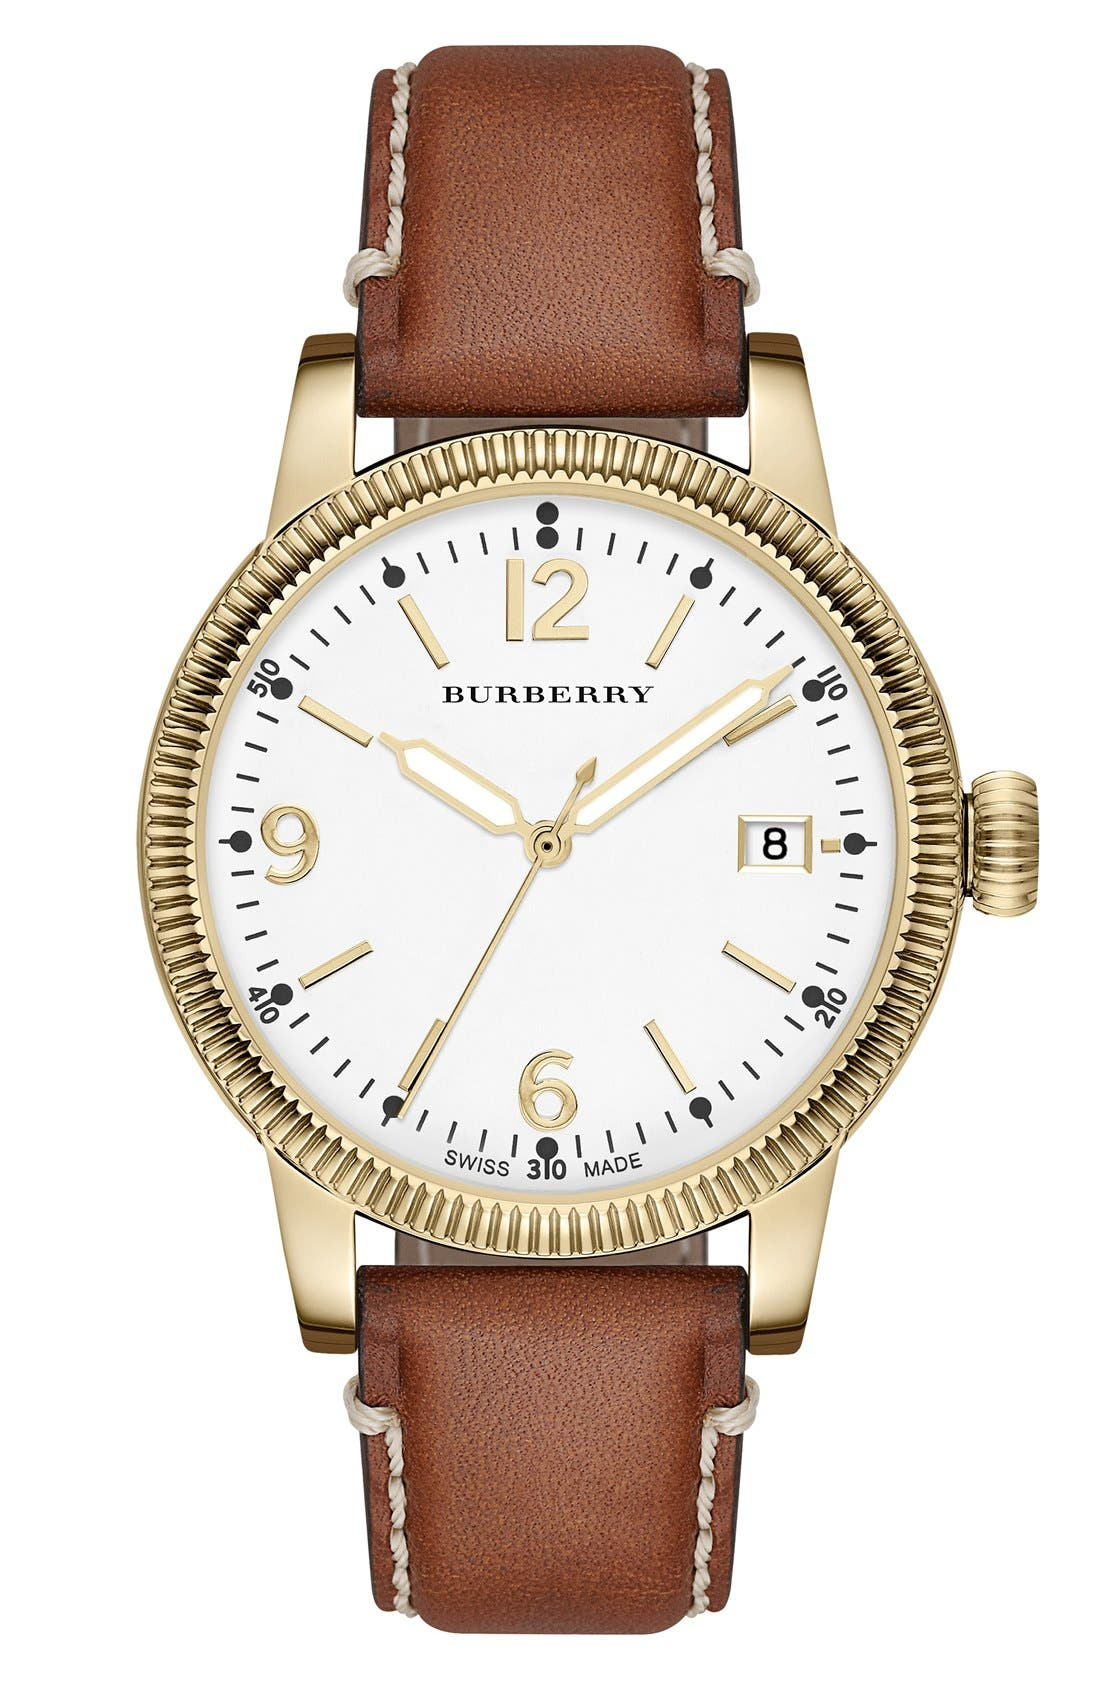 burberry 38mm watch